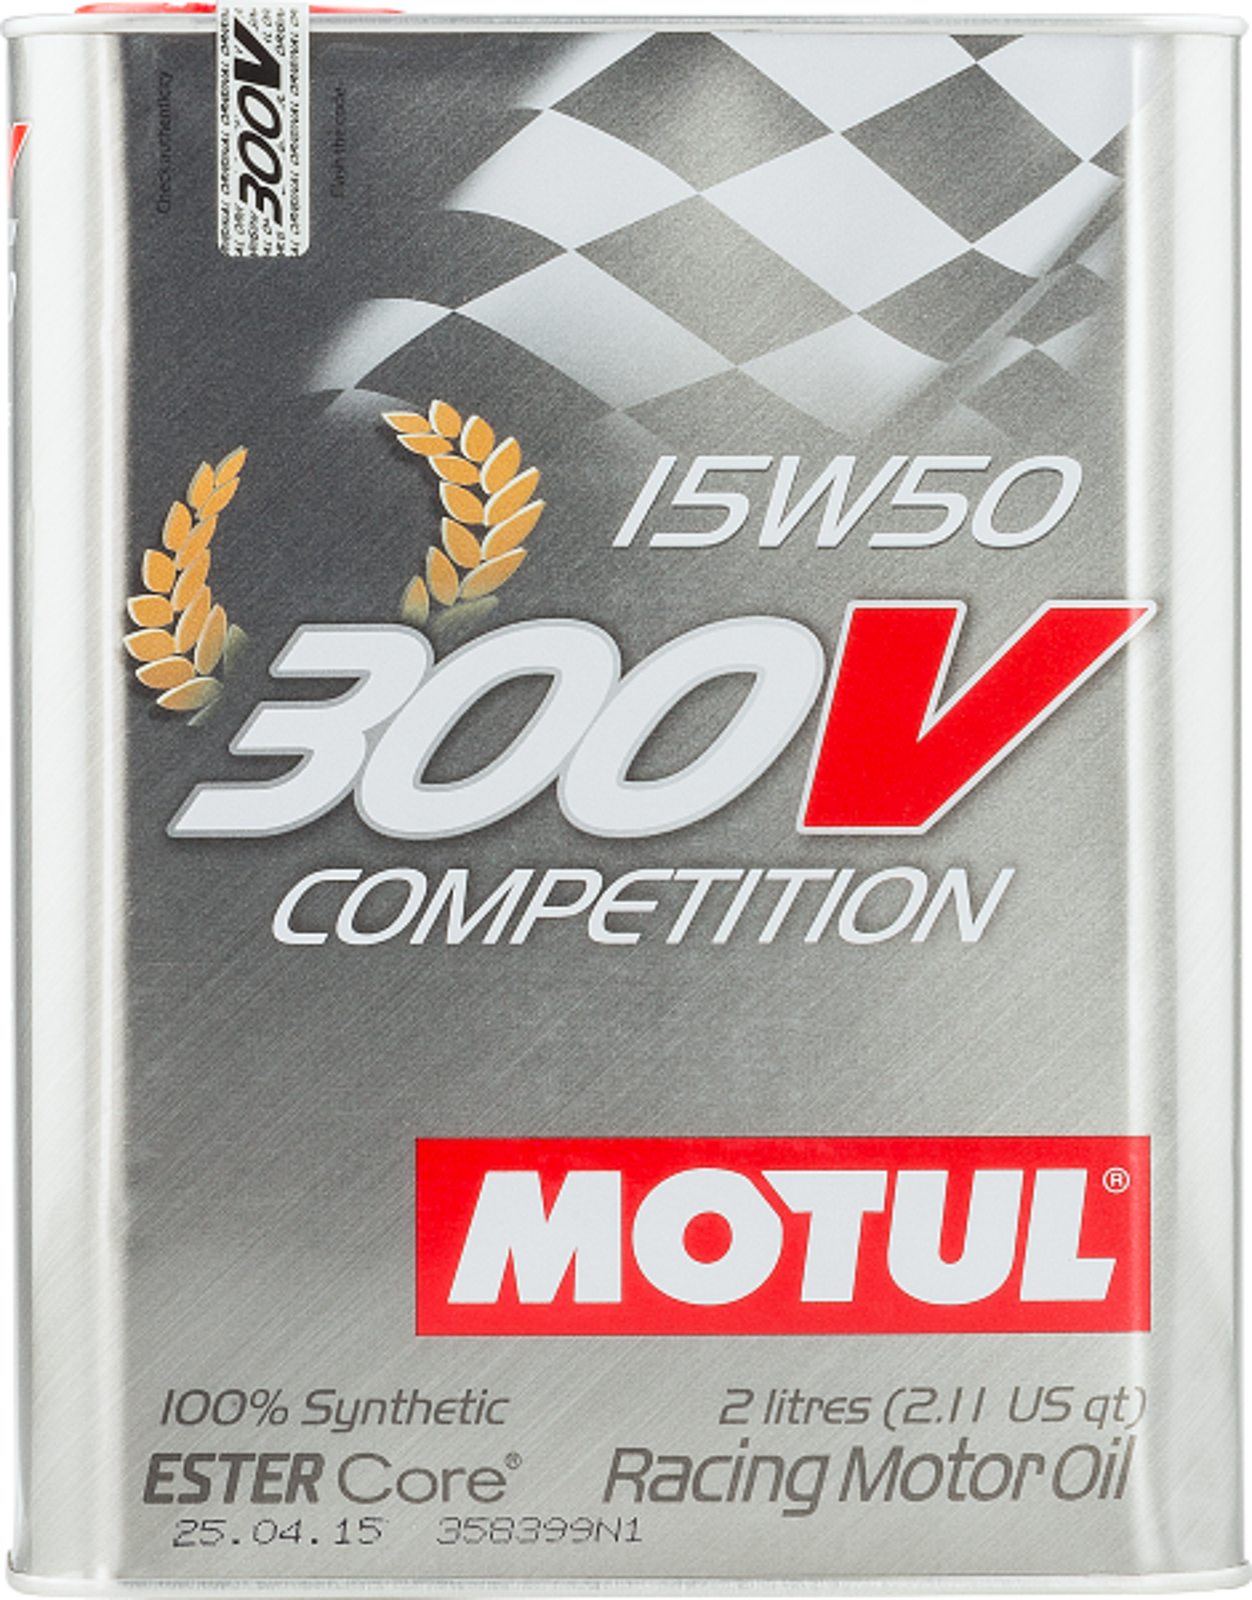 MOTUL AG MOTUL 300V Competition 15W-50 2L